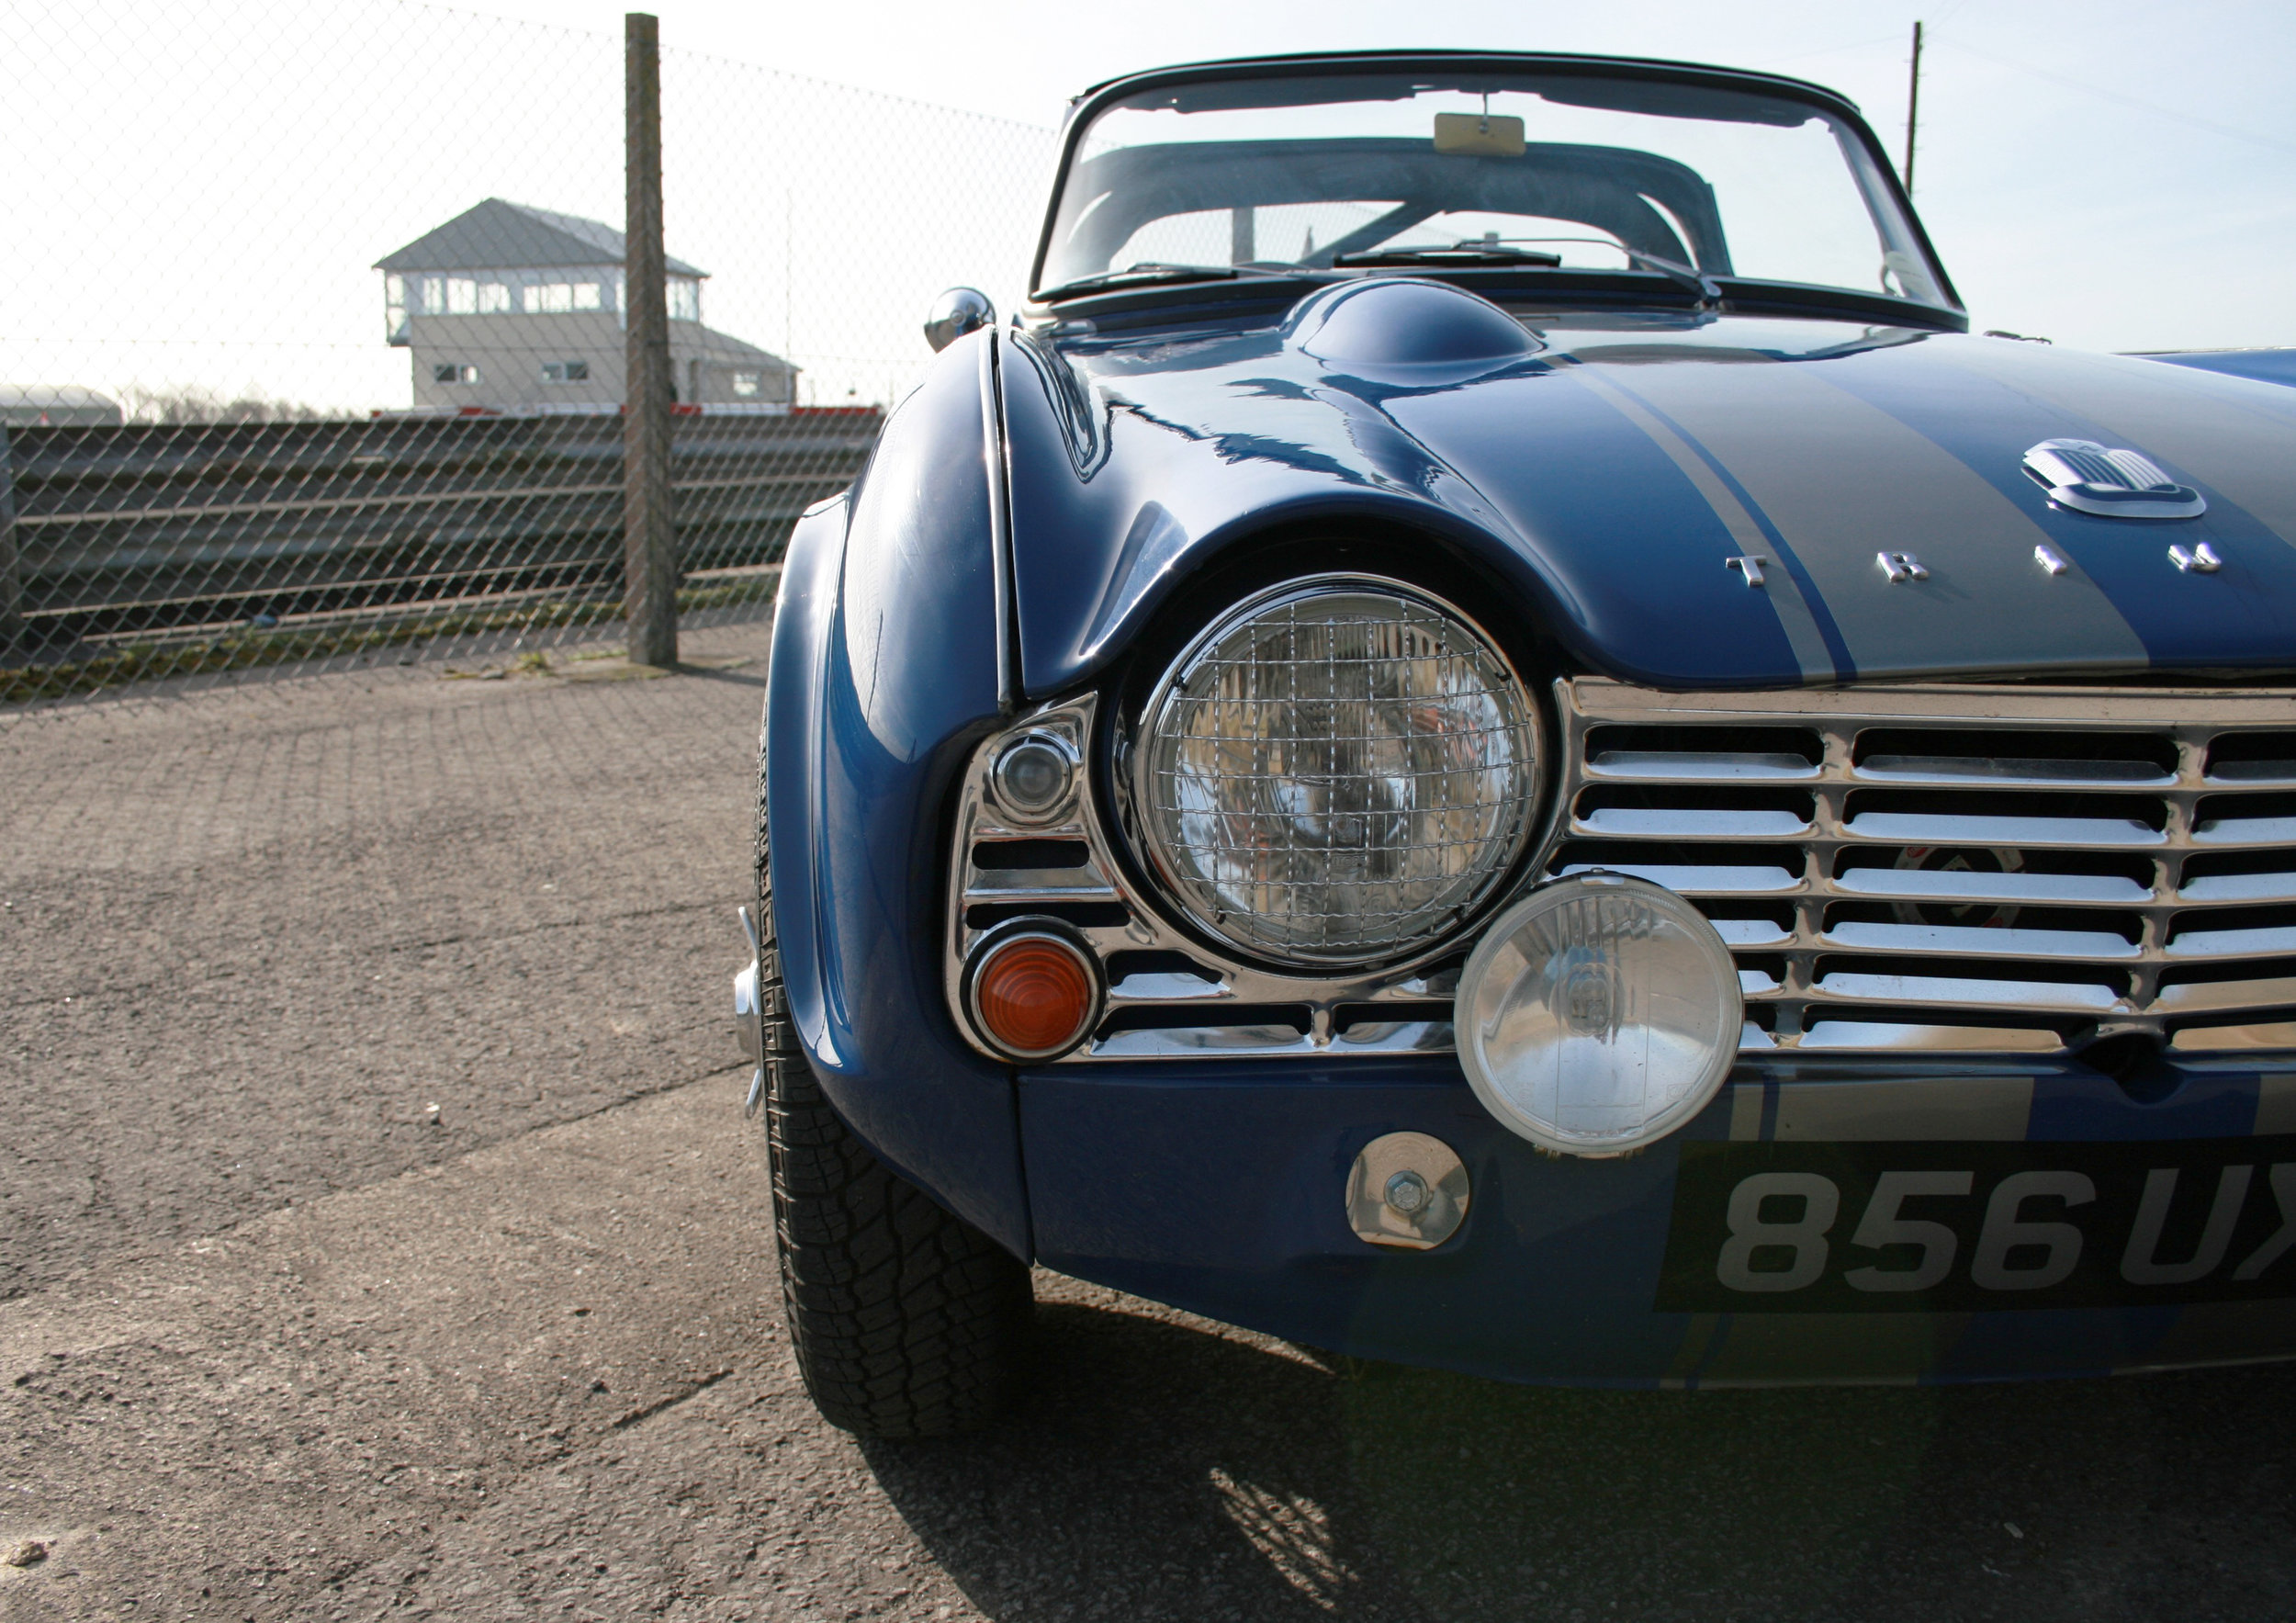 1964 Triumph Tr4 Rally Wdwins